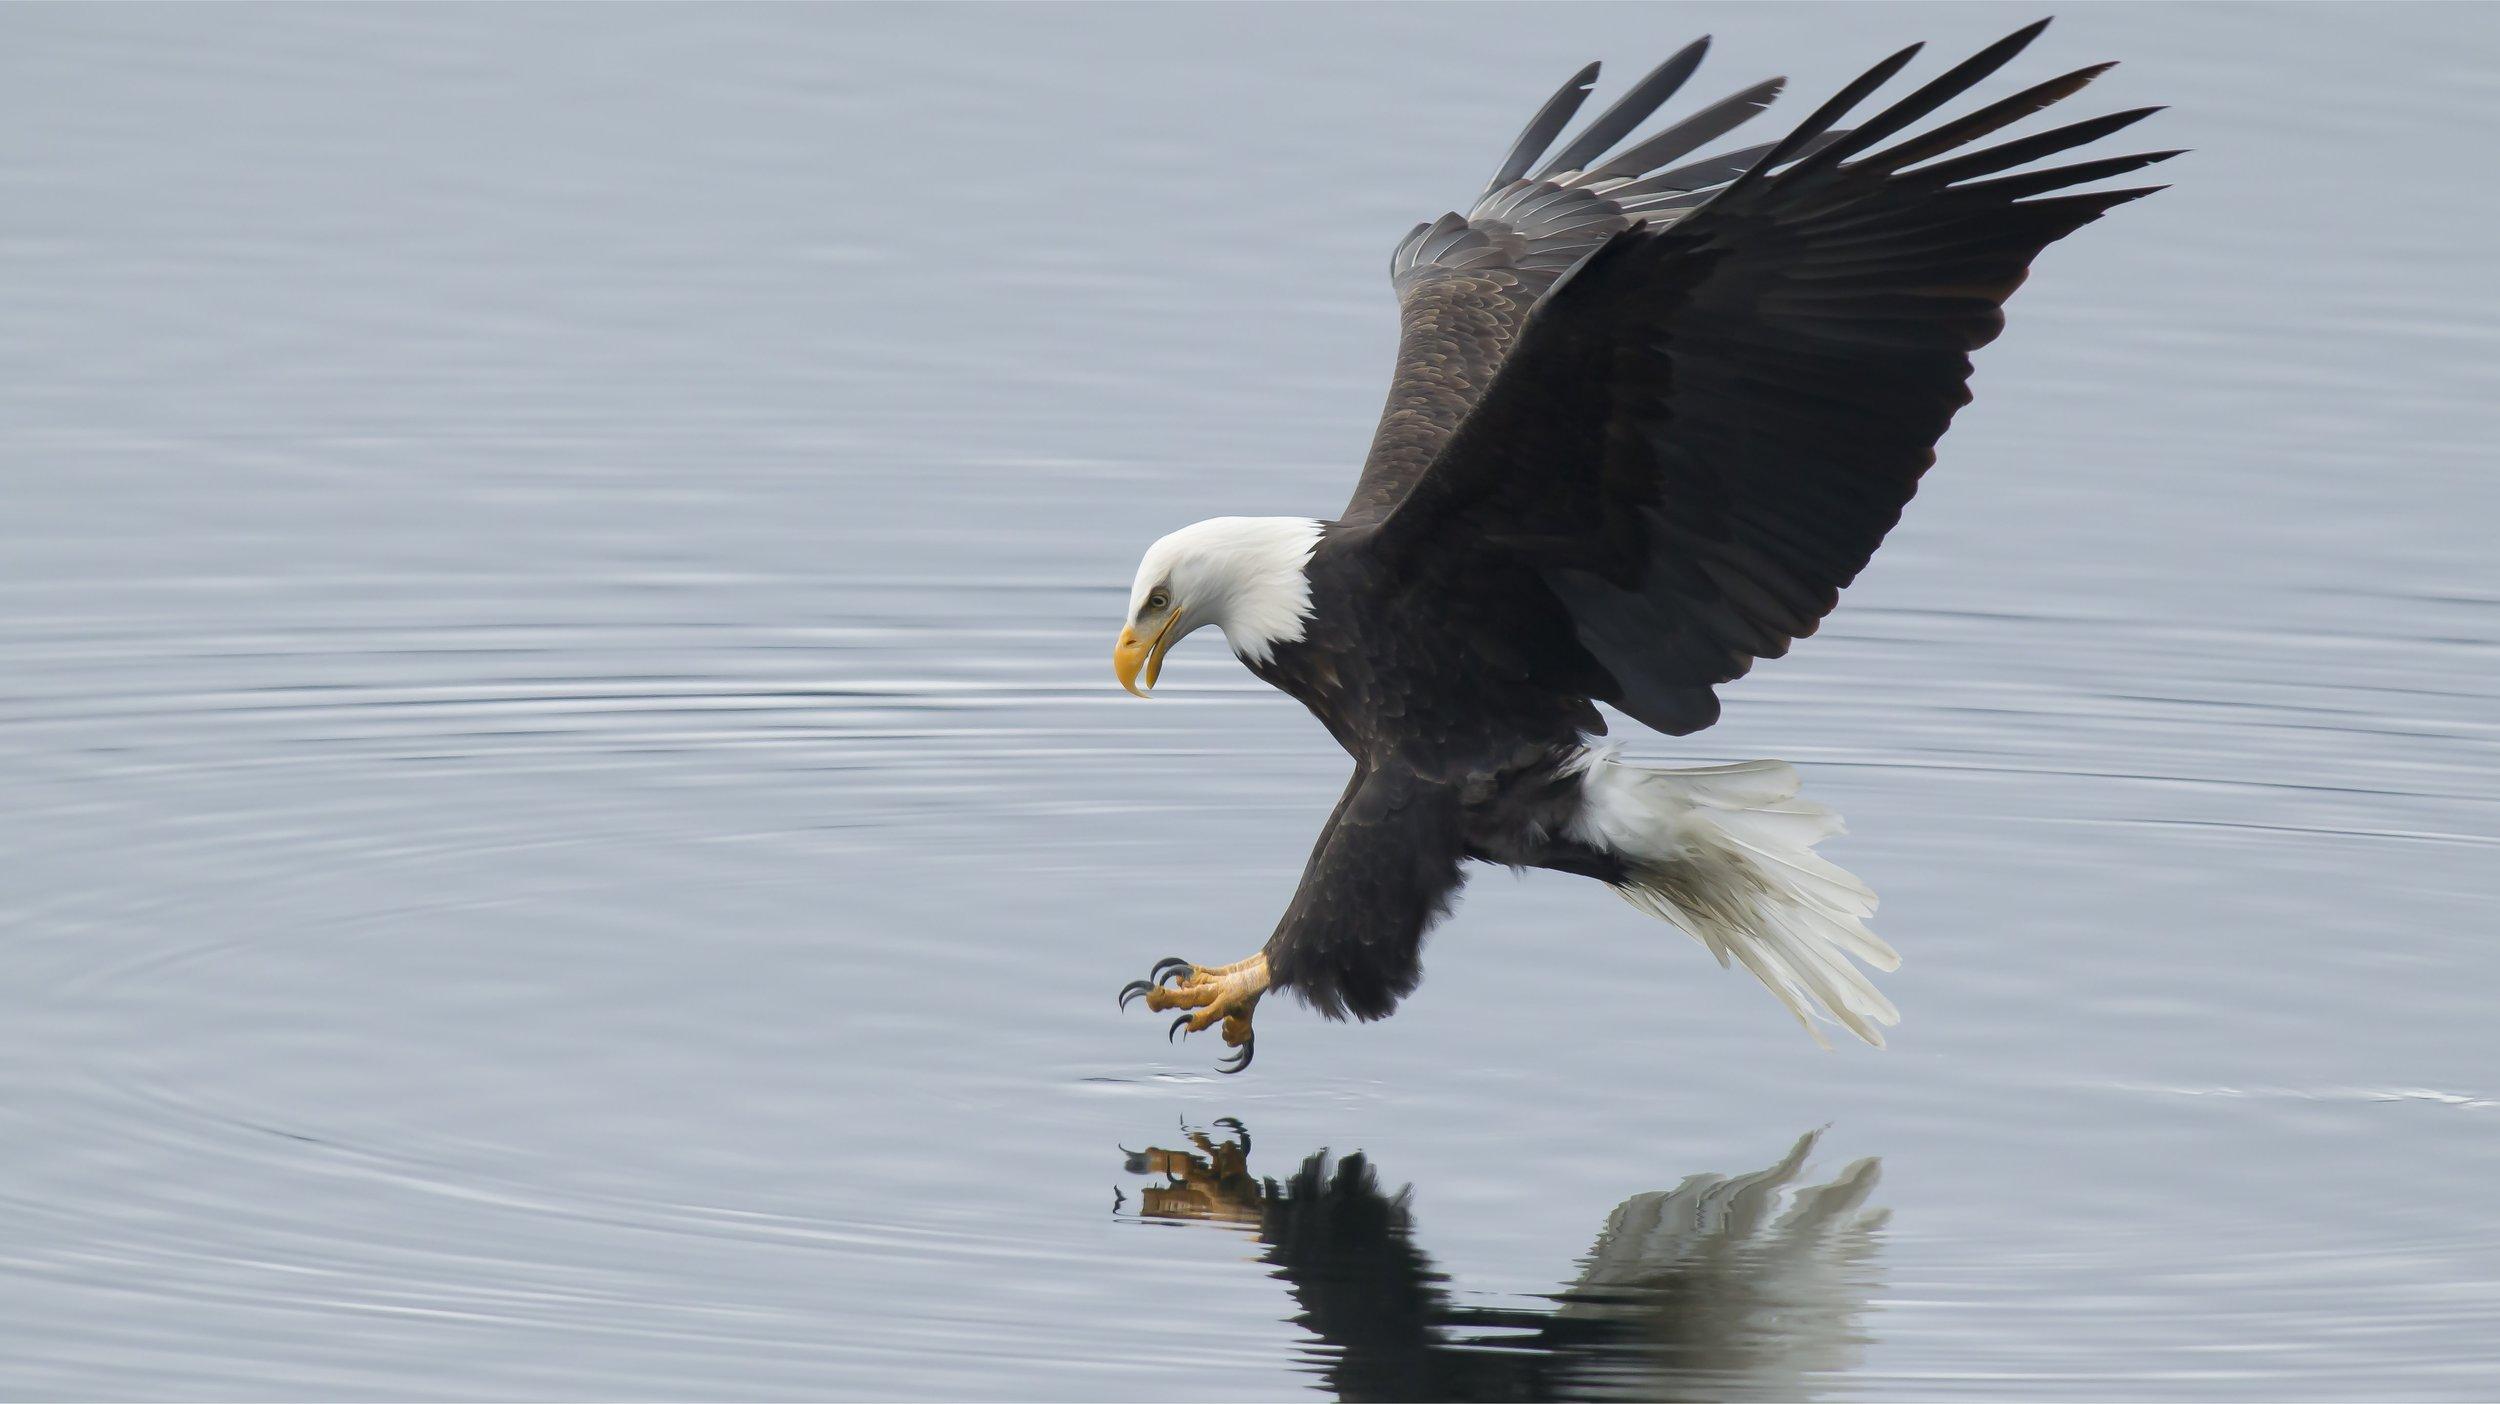 eagle_fishing_dp1.jpg